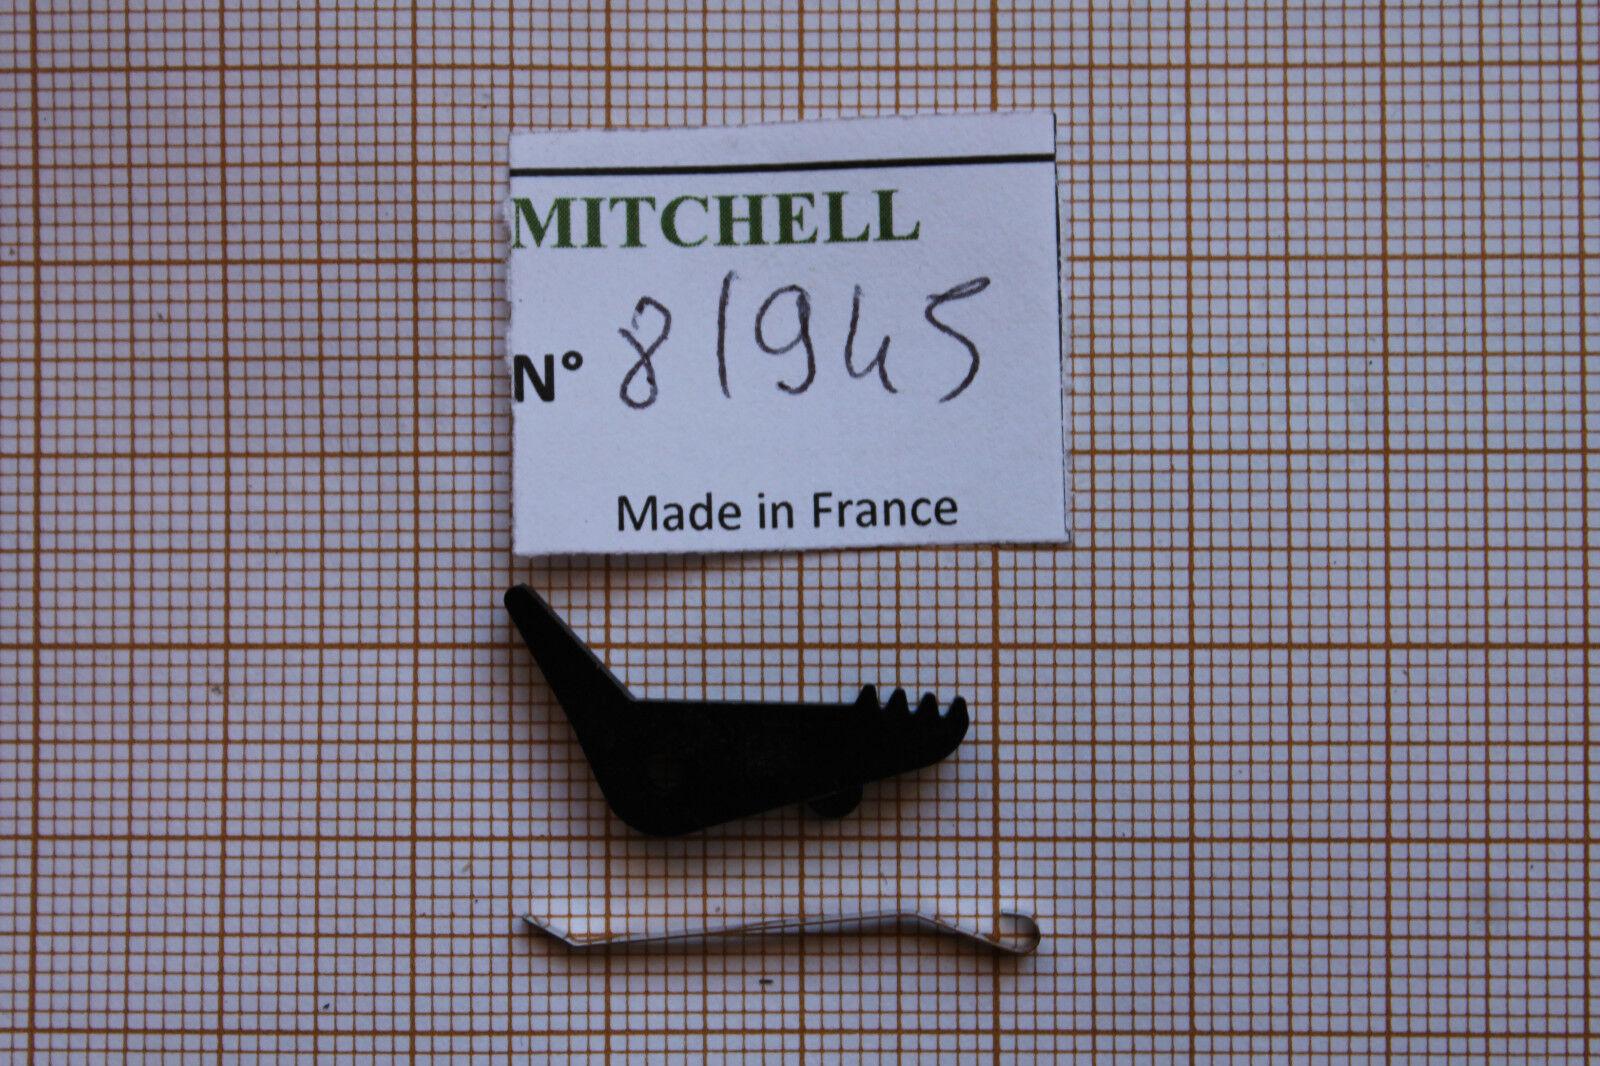 24 HAKEN ANTI RETOUR 300 REVERSE & MITCHELL ROLLE ANTI REVERSE 300 HUND ECHTER TEIL 81945 fc695f